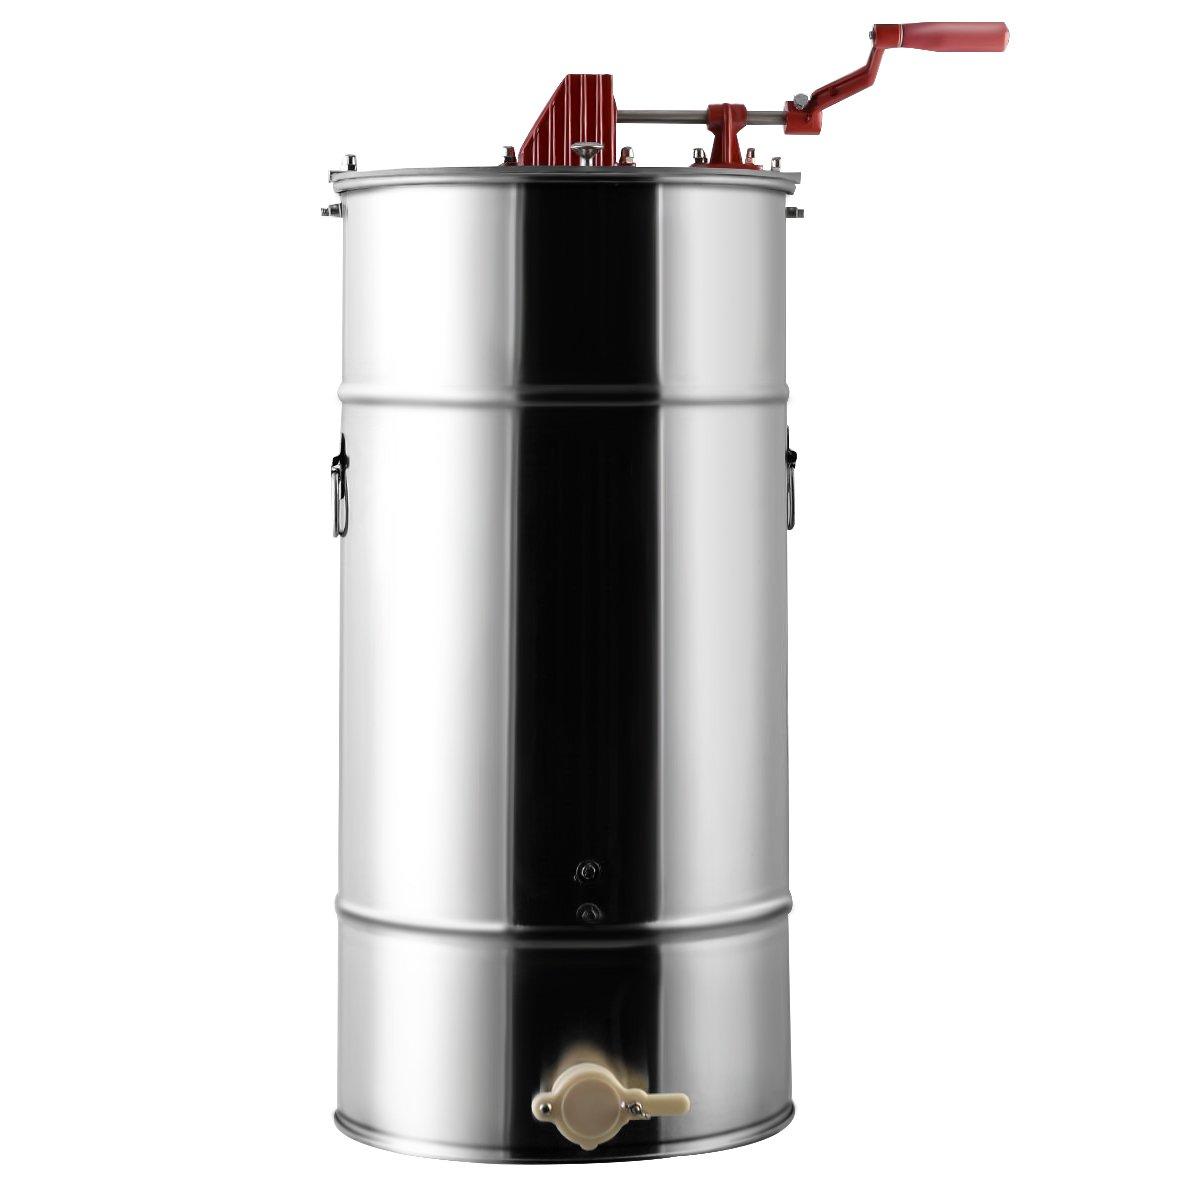 Goplus Large 2 Frame Stainless Steel Honey Extractor Beekeeping Equipment New by Goplus (Image #1)